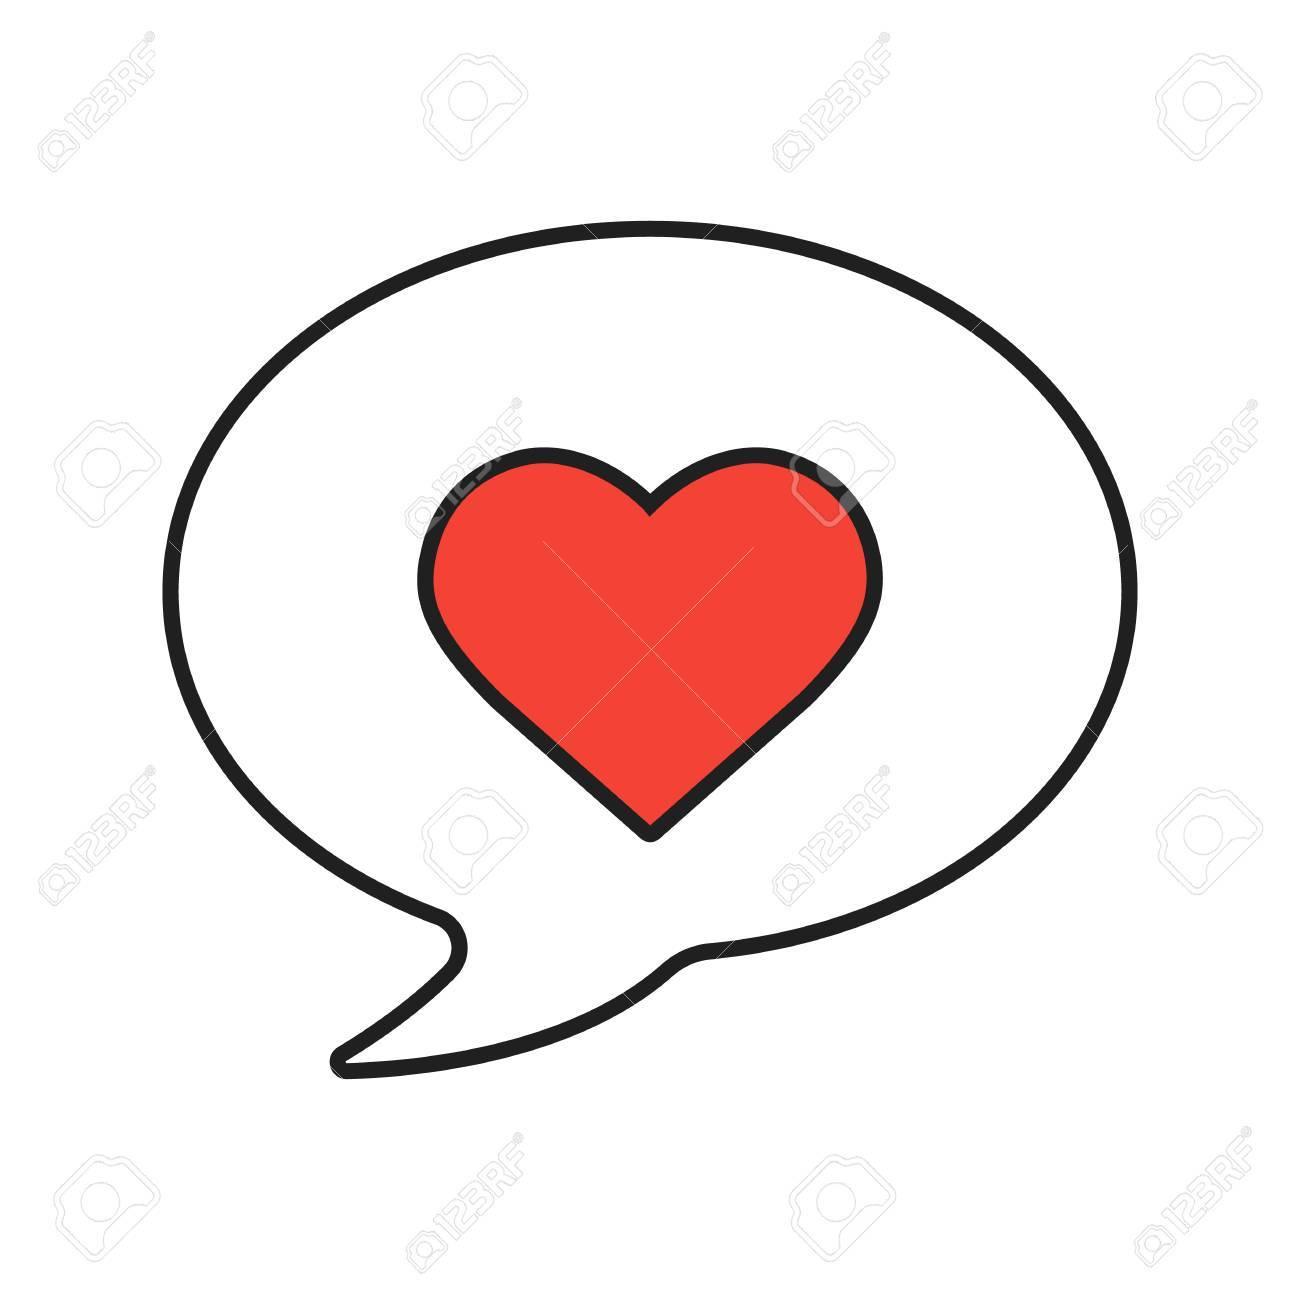 Love message linear icon thin line illustration romantic sms love message linear icon thin line illustration romantic sms with heart contour symbol biocorpaavc